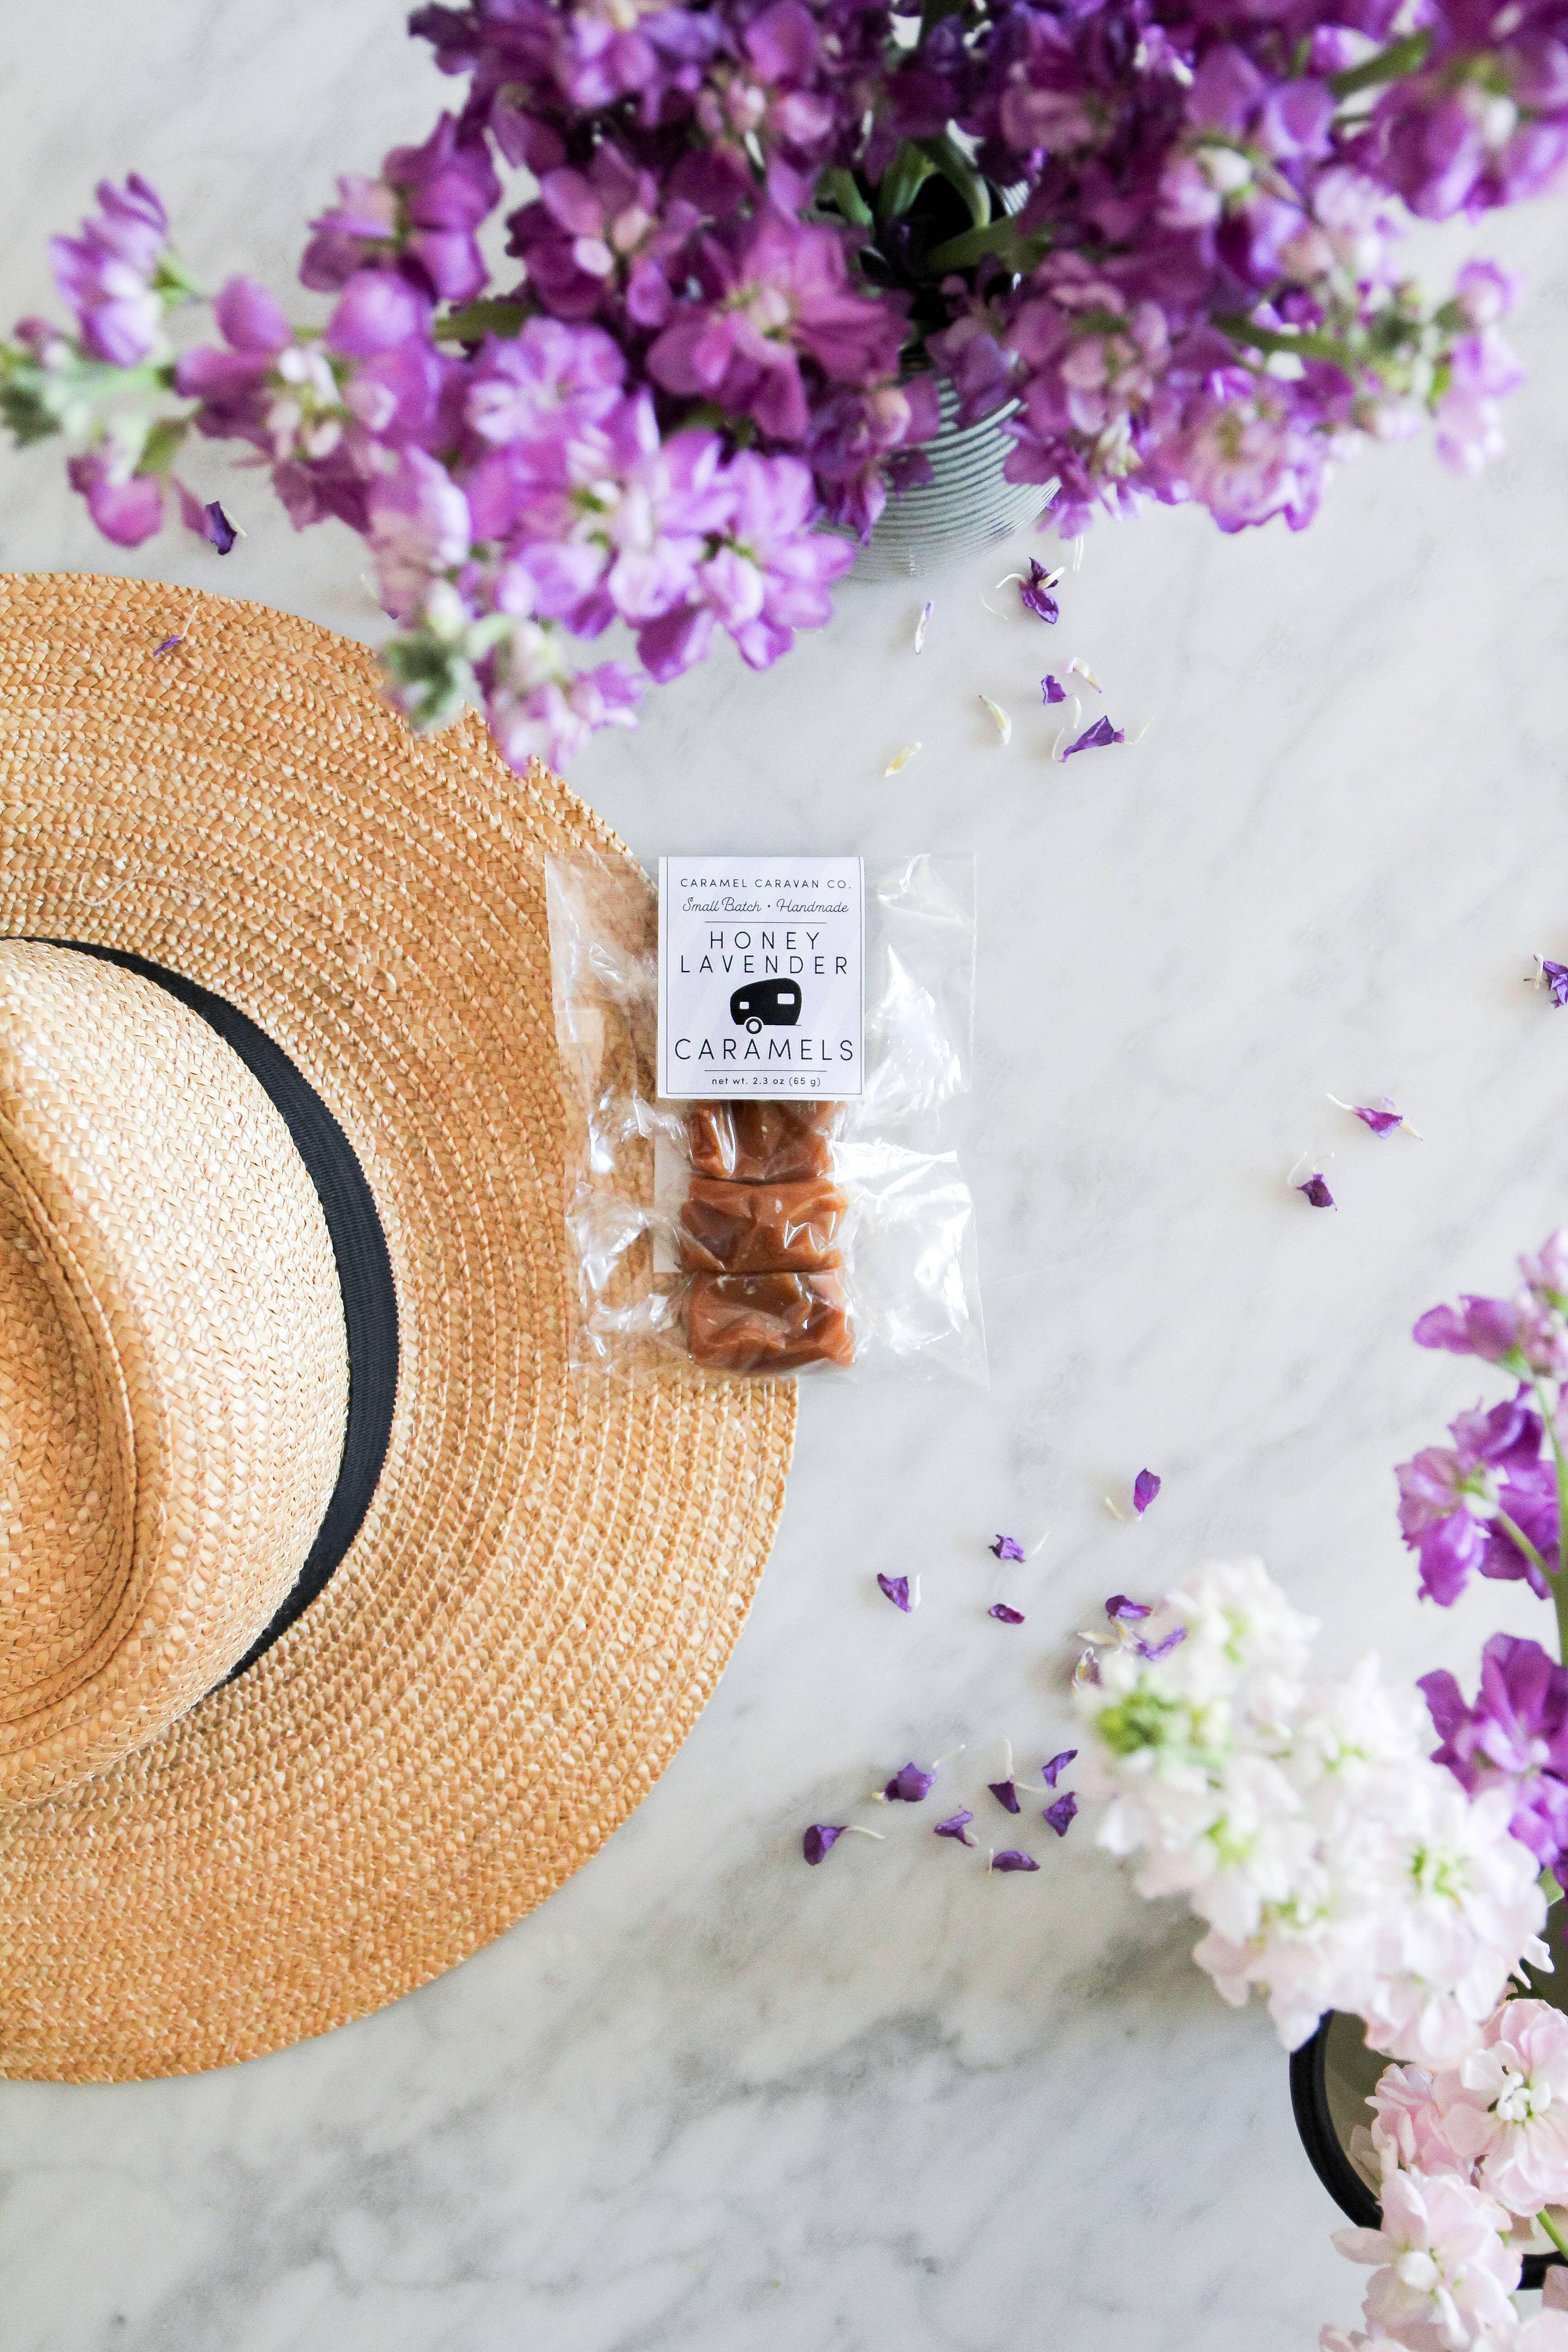 Honey Lavender Caramels - 4 Piece Bag | Trada Marketplace